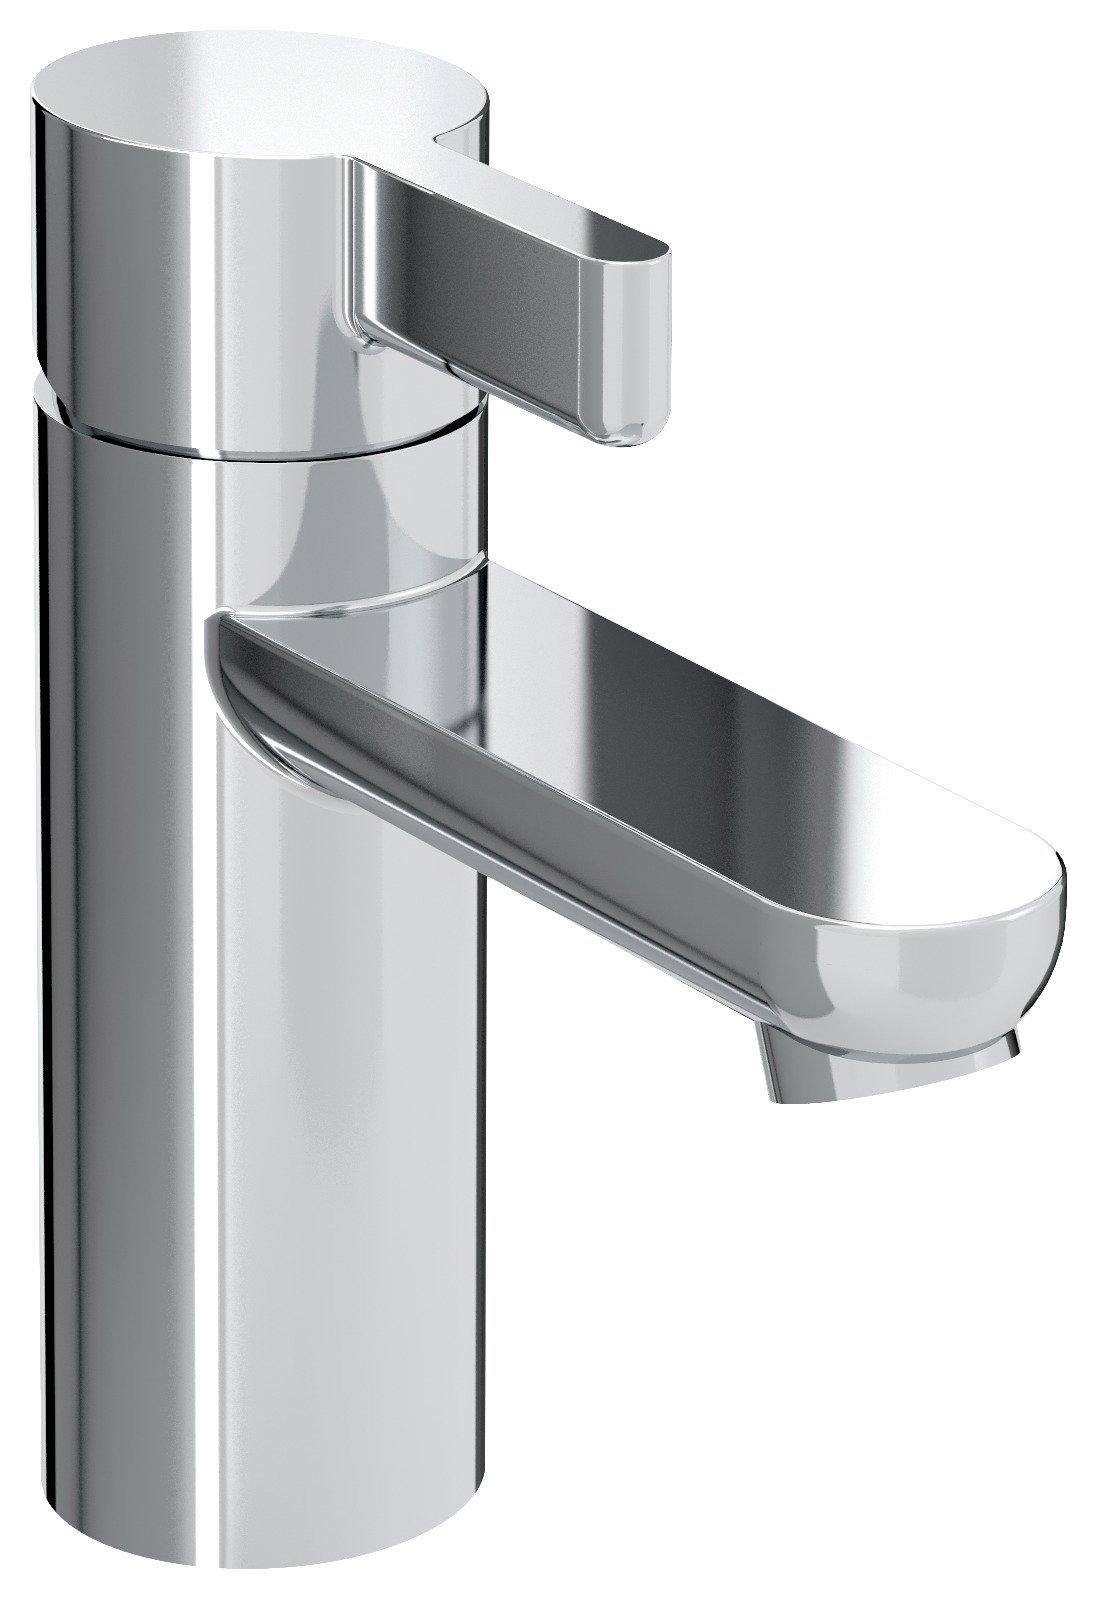 Bristan Clio Basin Mixer Taps - Chrome